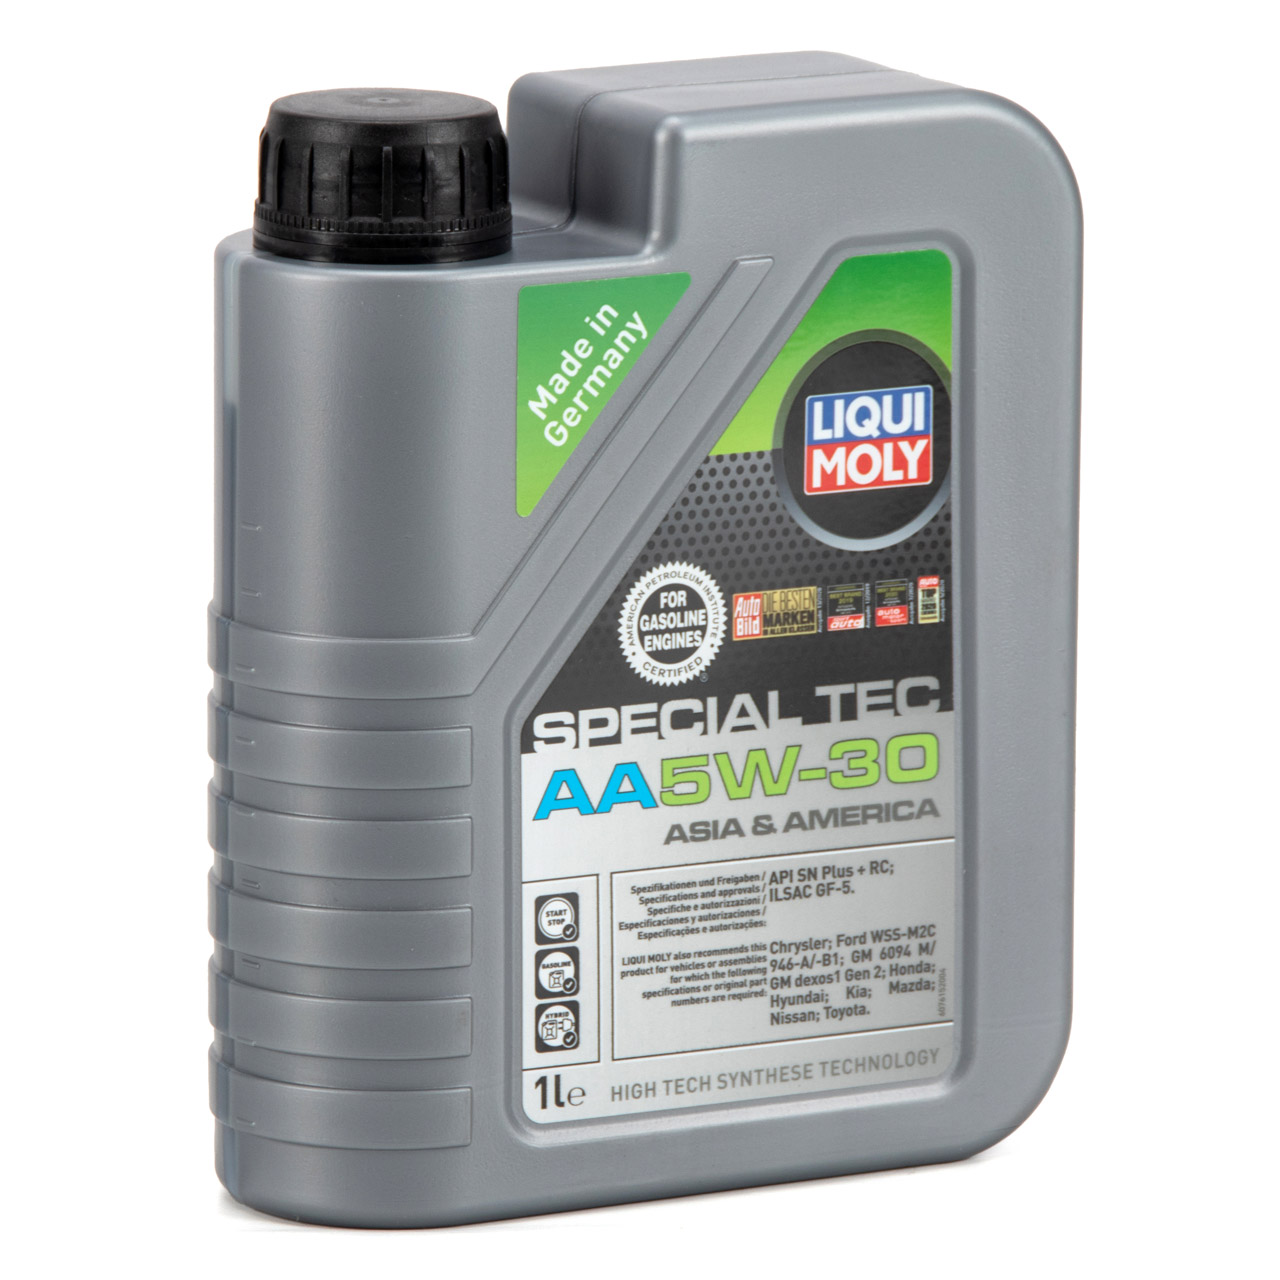 LIQUI MOLY 20953 Motoröl Öl SPECIAL TEC AA 5W-30 ASIA & AMERICA - 1L 1 Liter